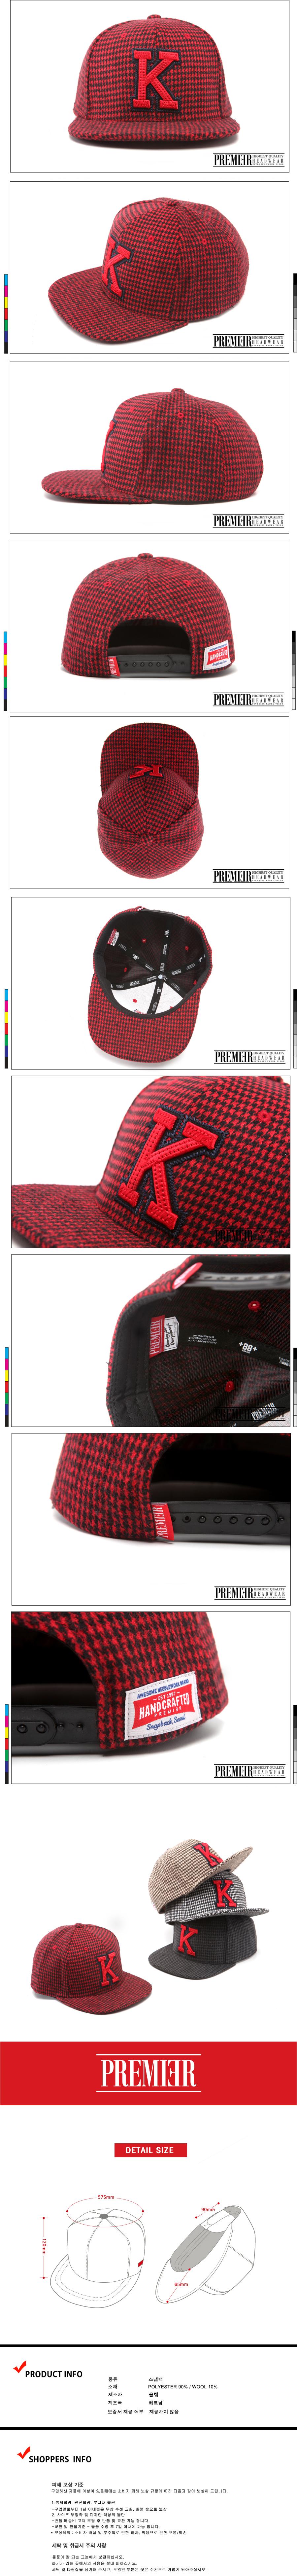 [ PREMIER ] [Premier] Hound Tooth Check K Logo Red